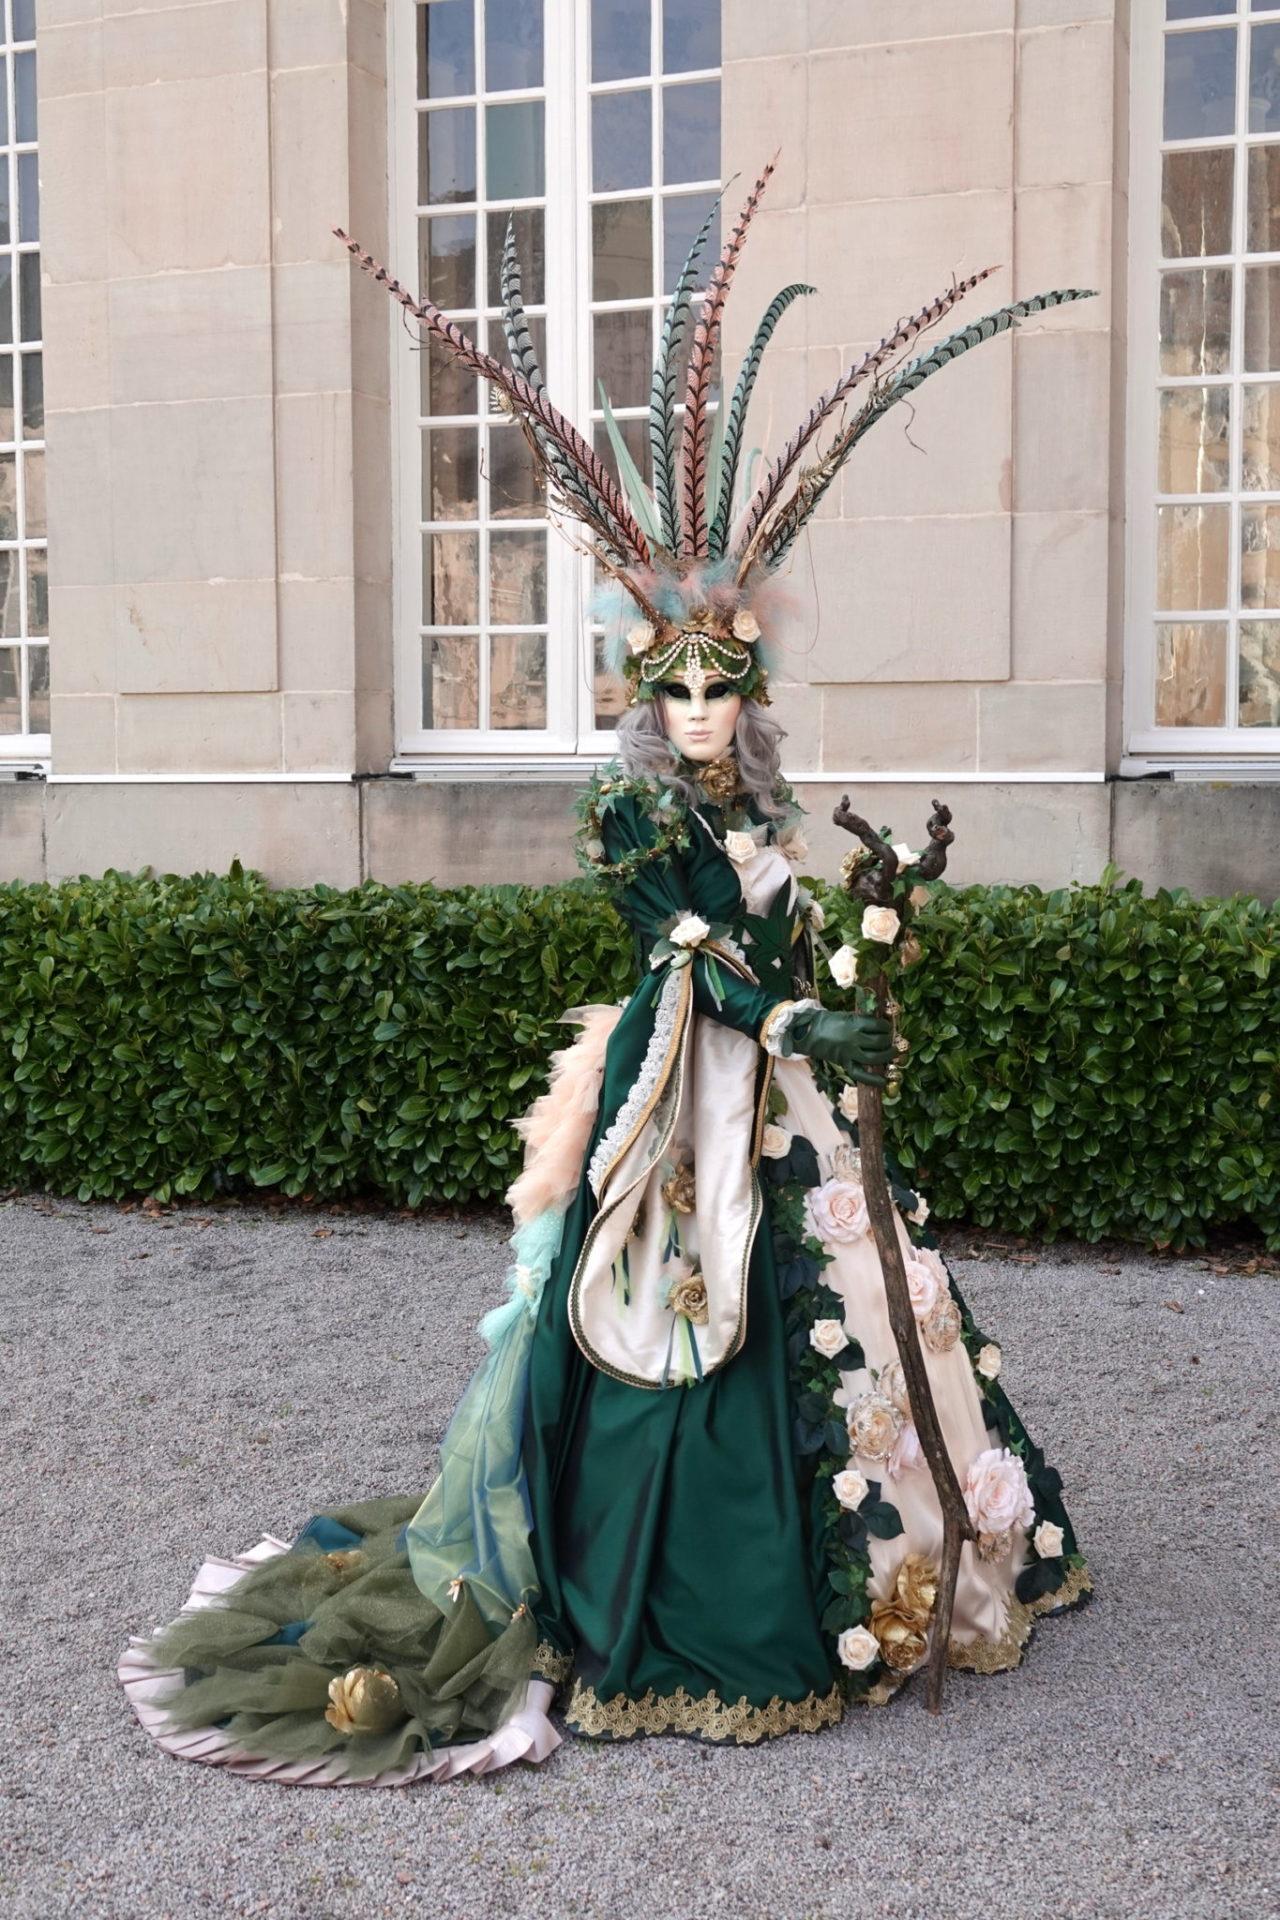 Costume Forêt de plumes et roses ivoires - Photo Ingrid et Arno Martini